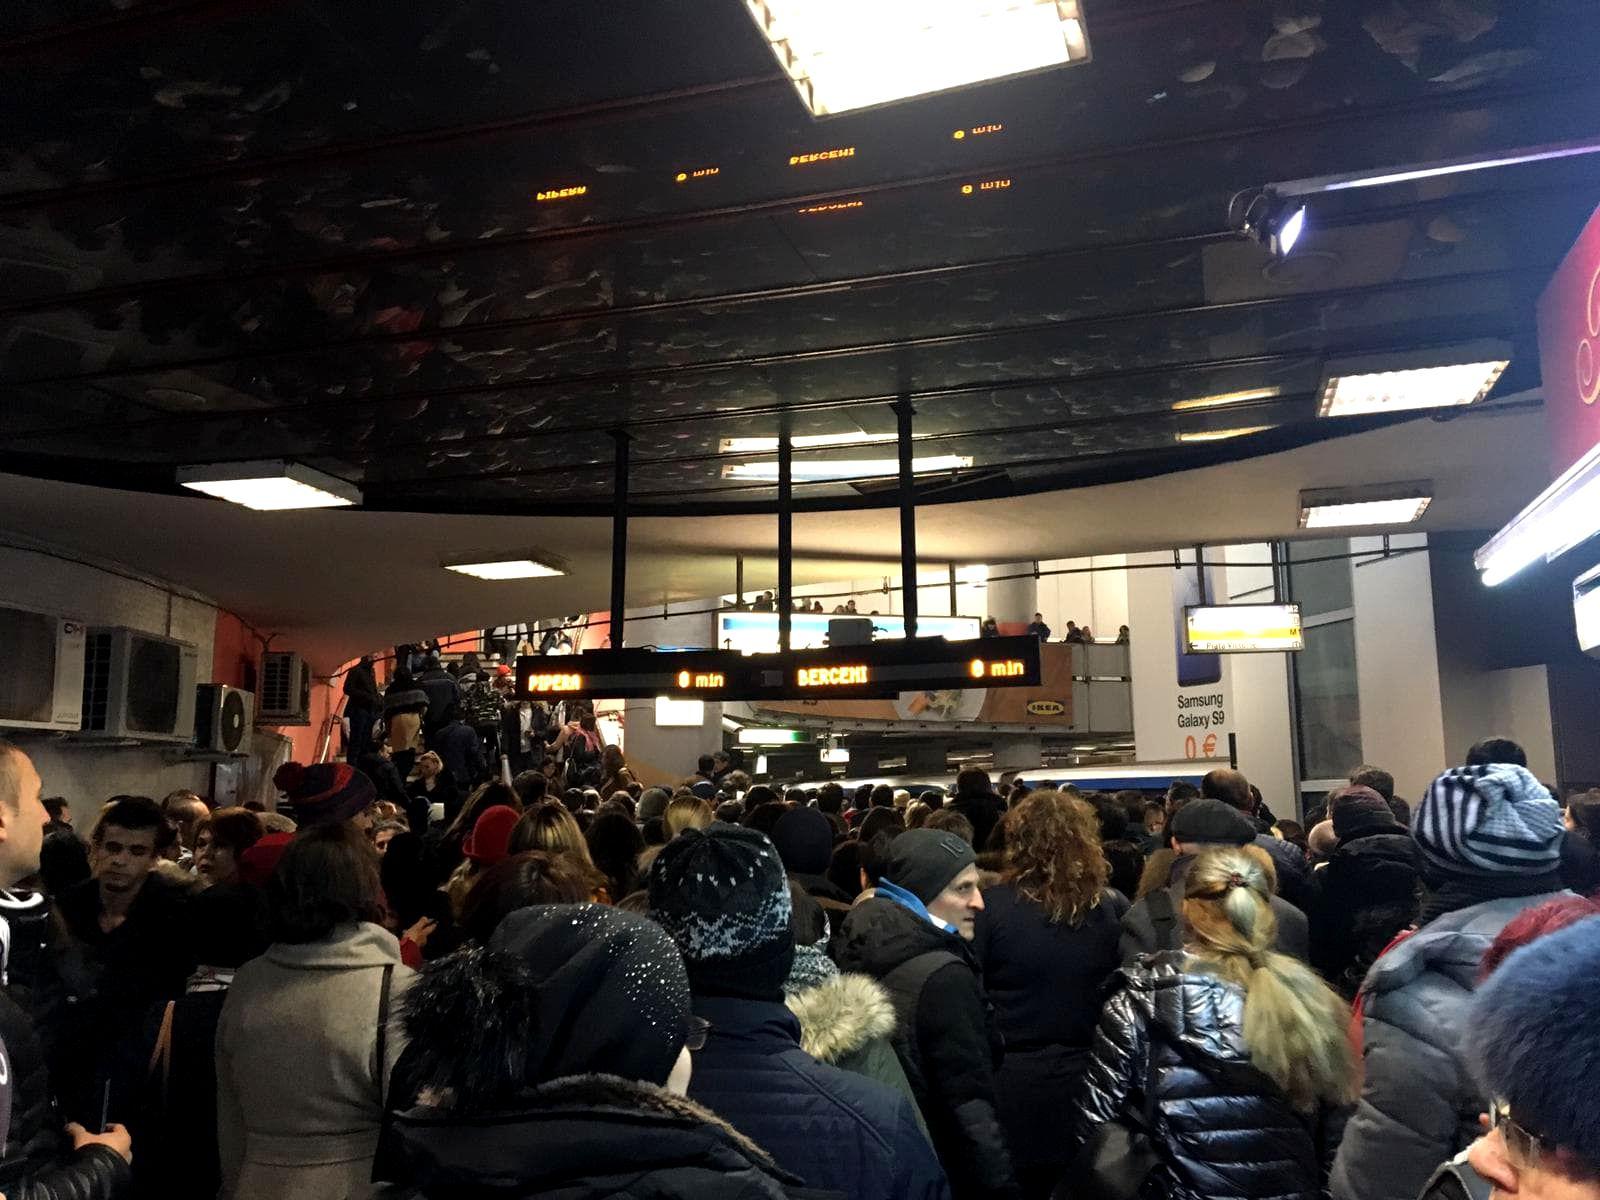 defectiuni la metrou aglomeratie vineri dimineata la piata victoriei